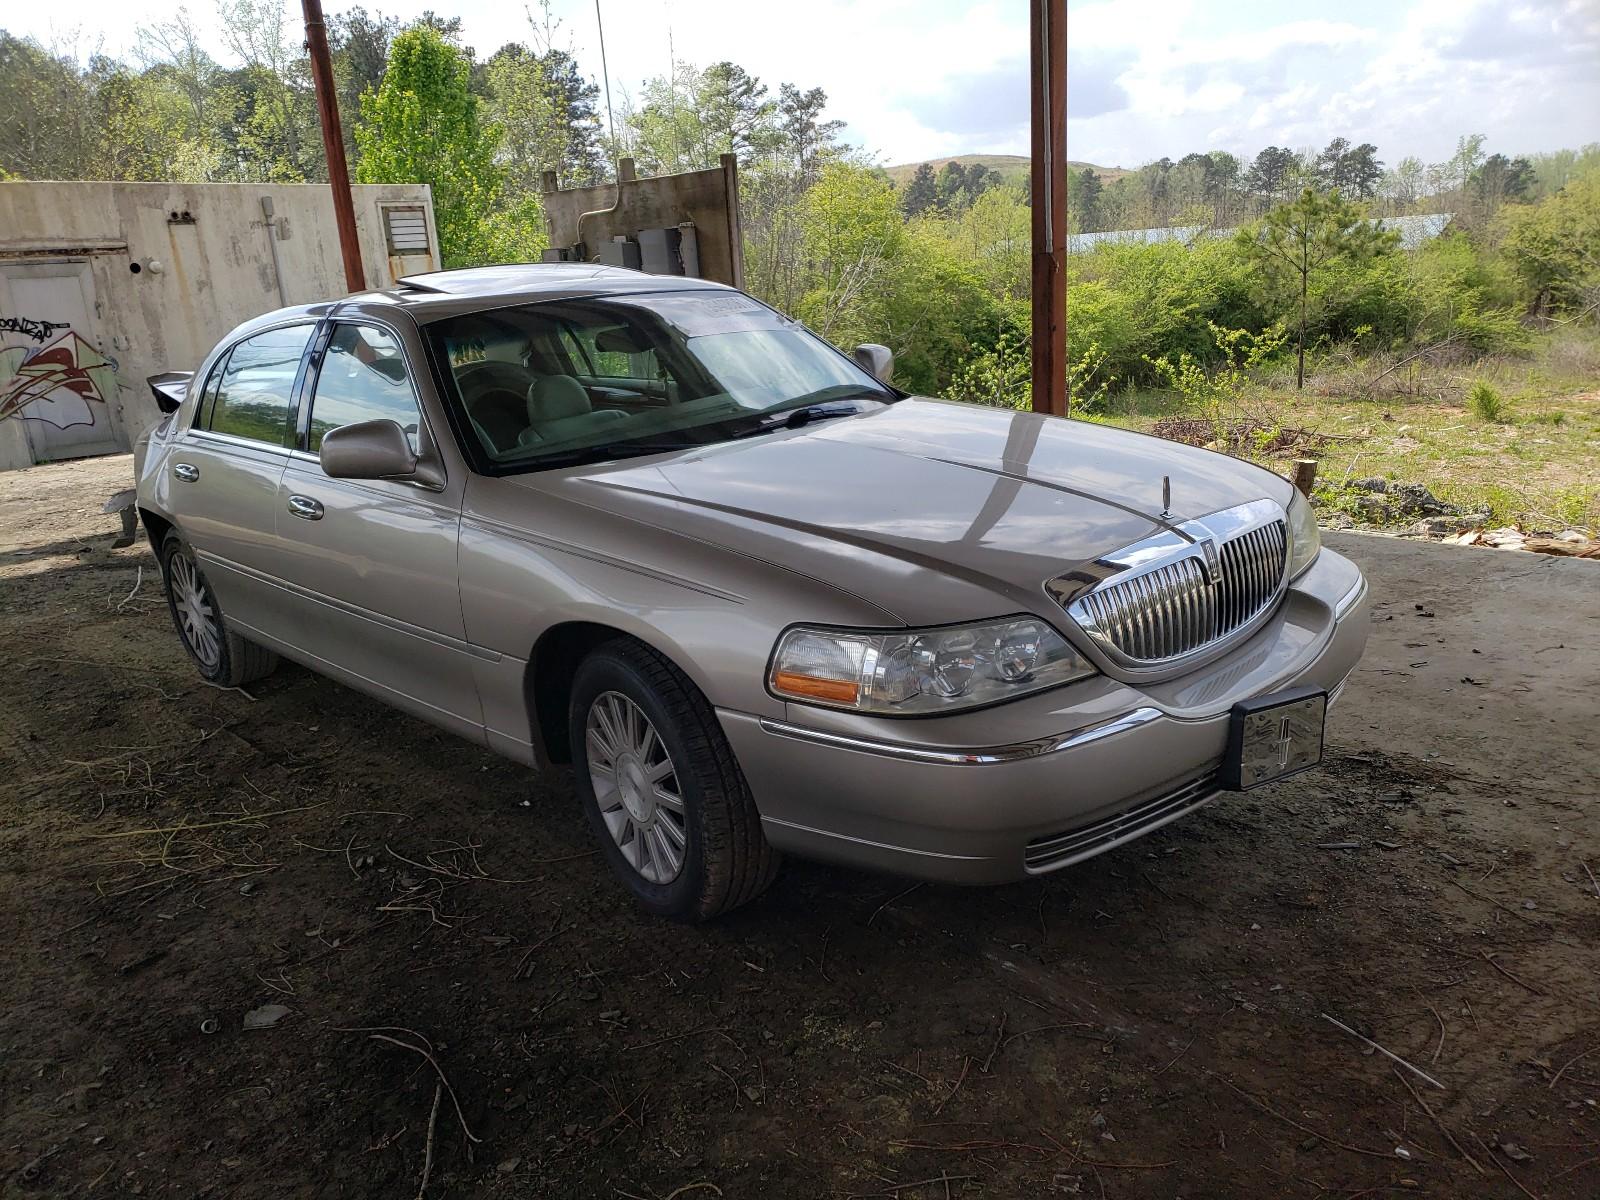 2003 LINCOLN TOWN CAR S - 1LNHM82W23Y663059